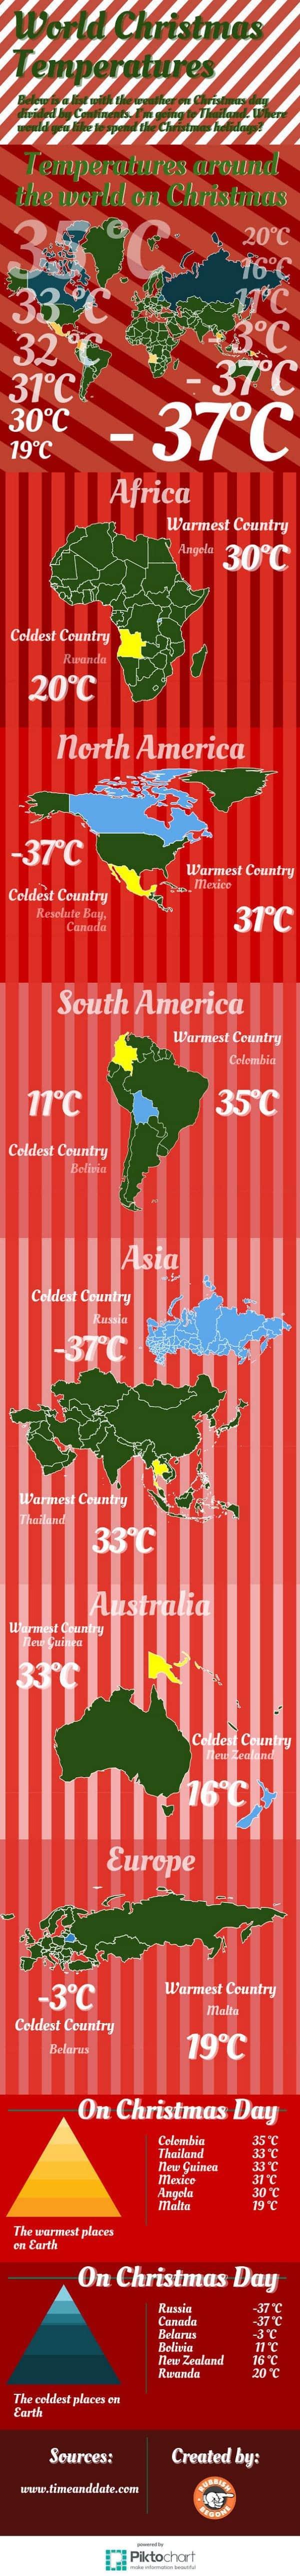 world christmas temperatures